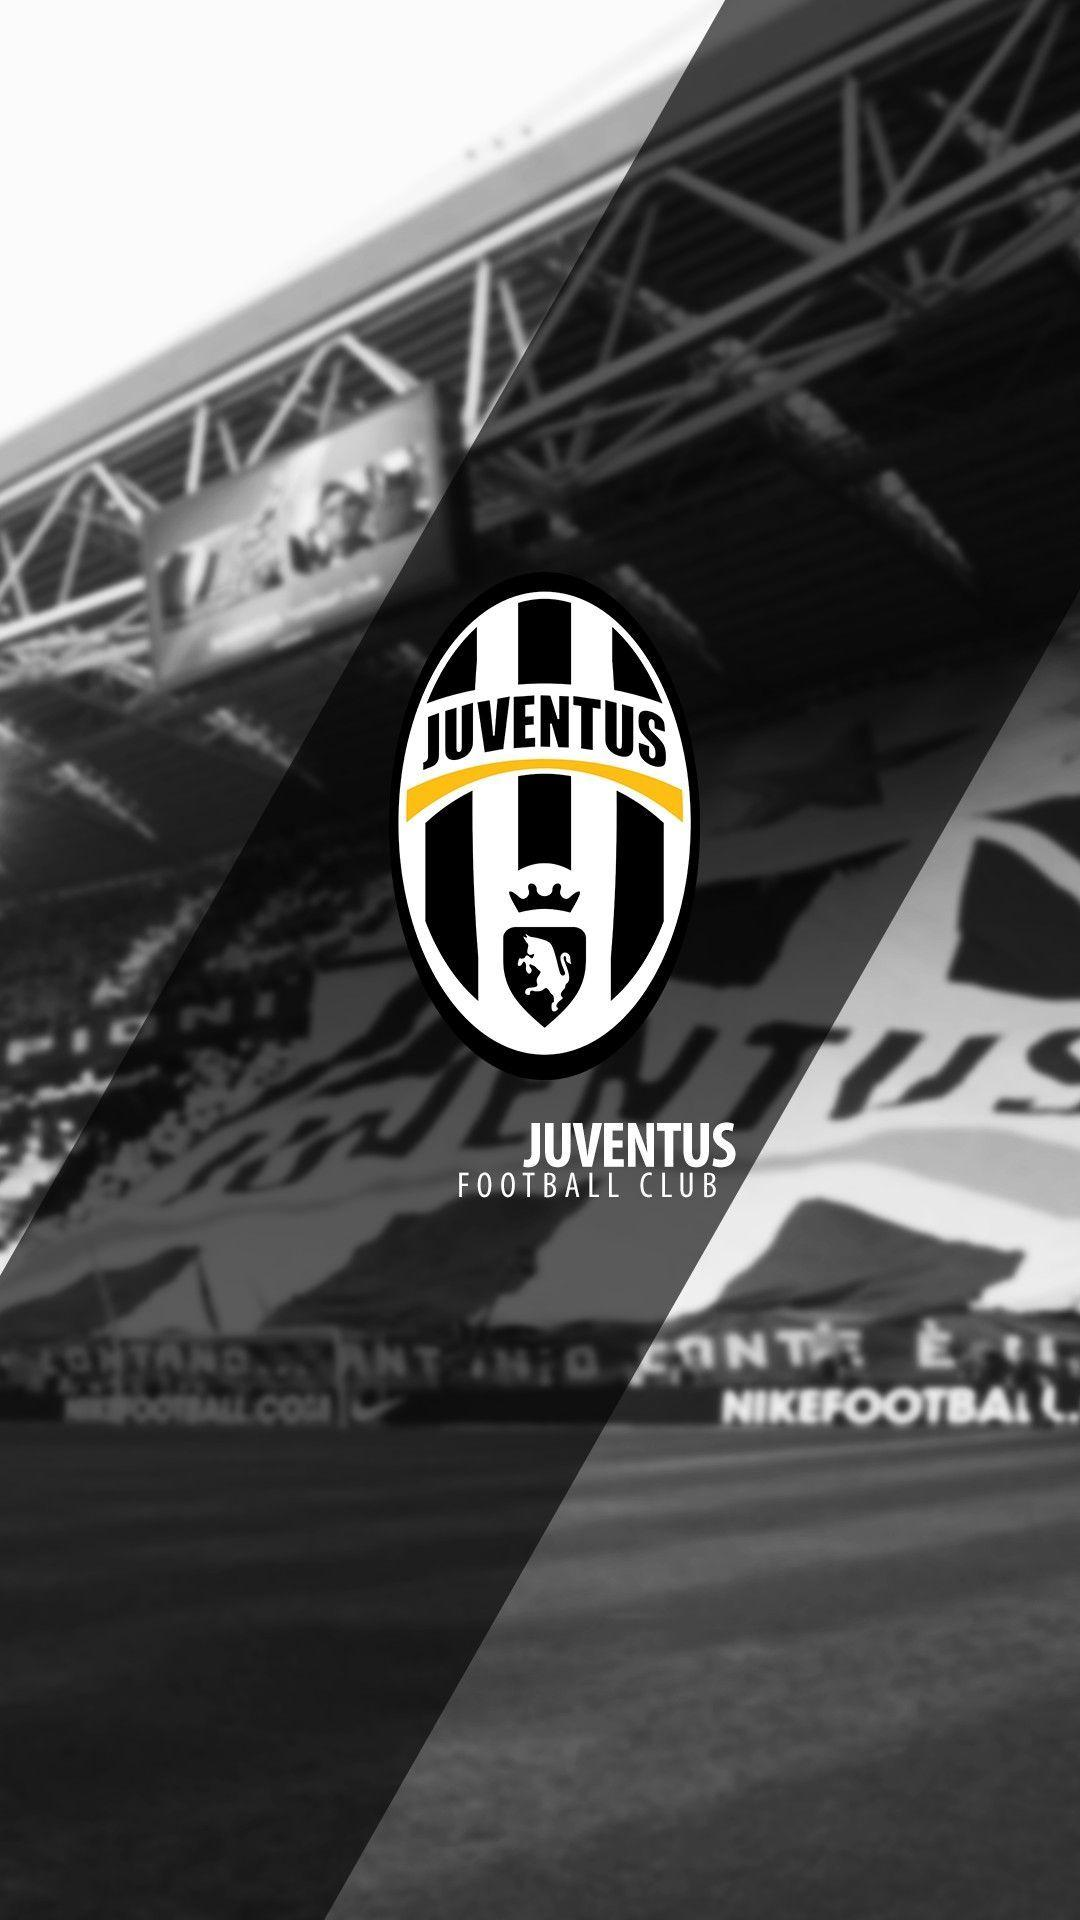 Juventus 2018 Wallpapers Wallpaper Cave